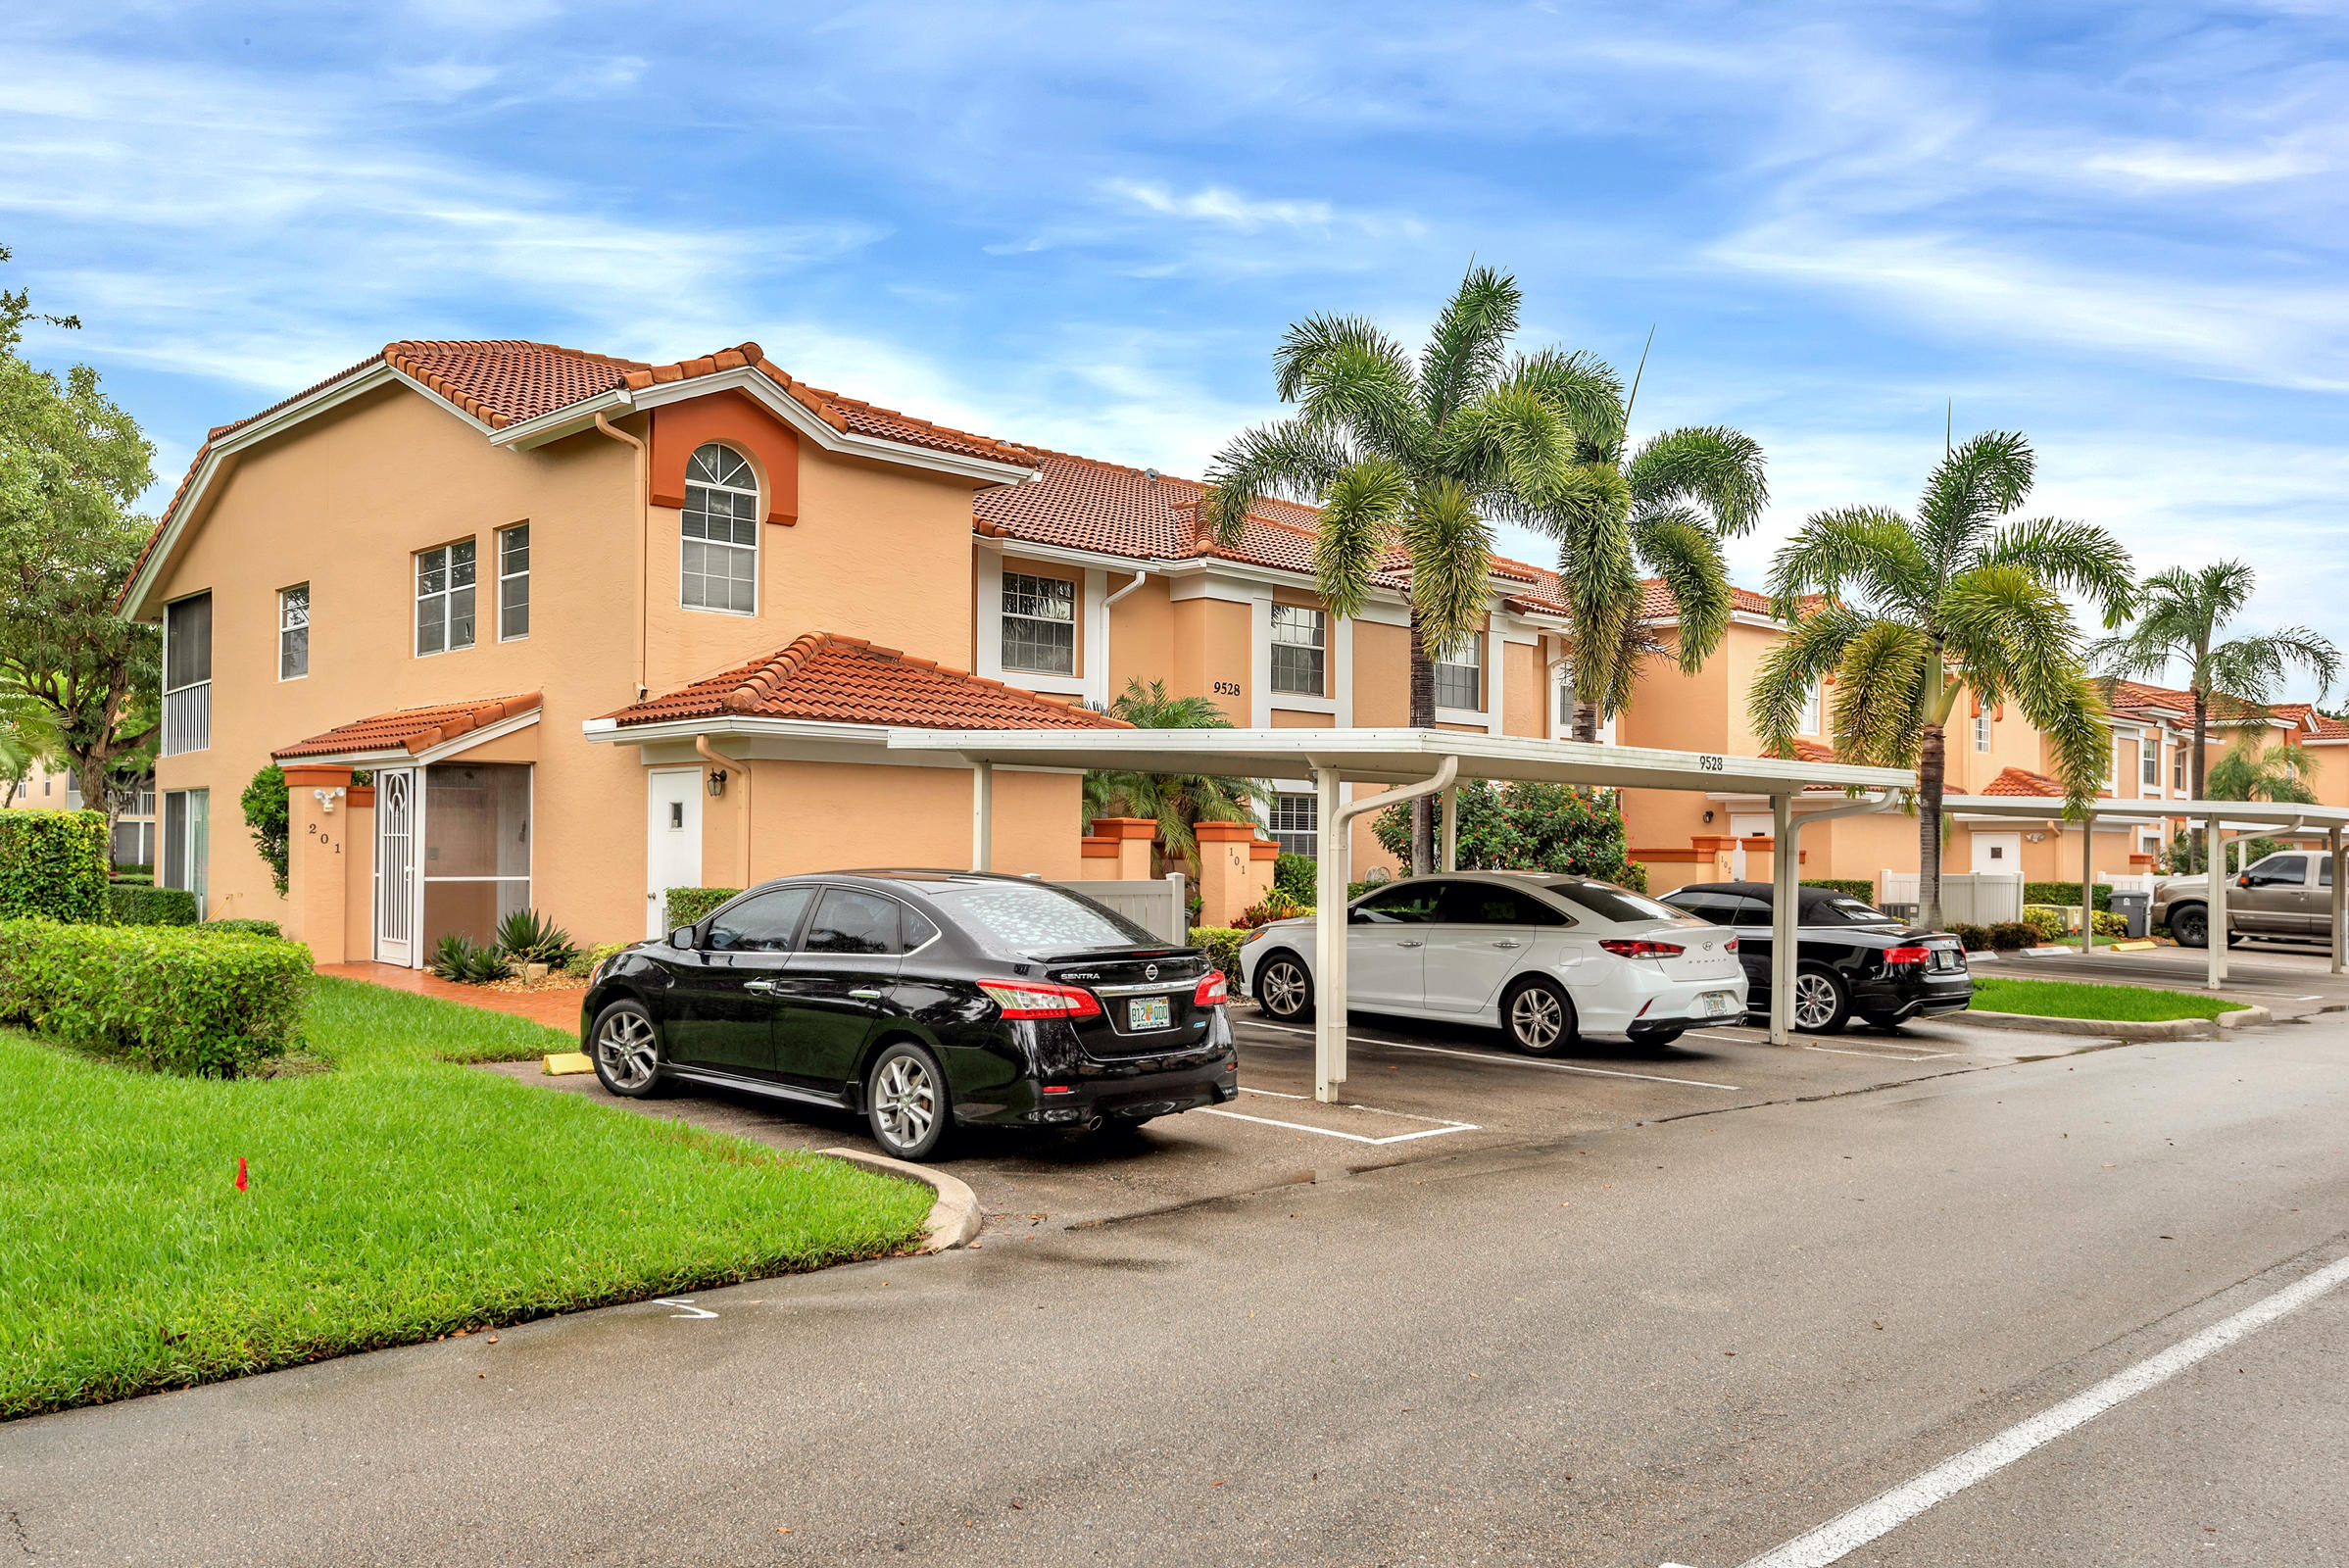 9528 Shadybrook Drive 201  Boynton Beach FL 33437